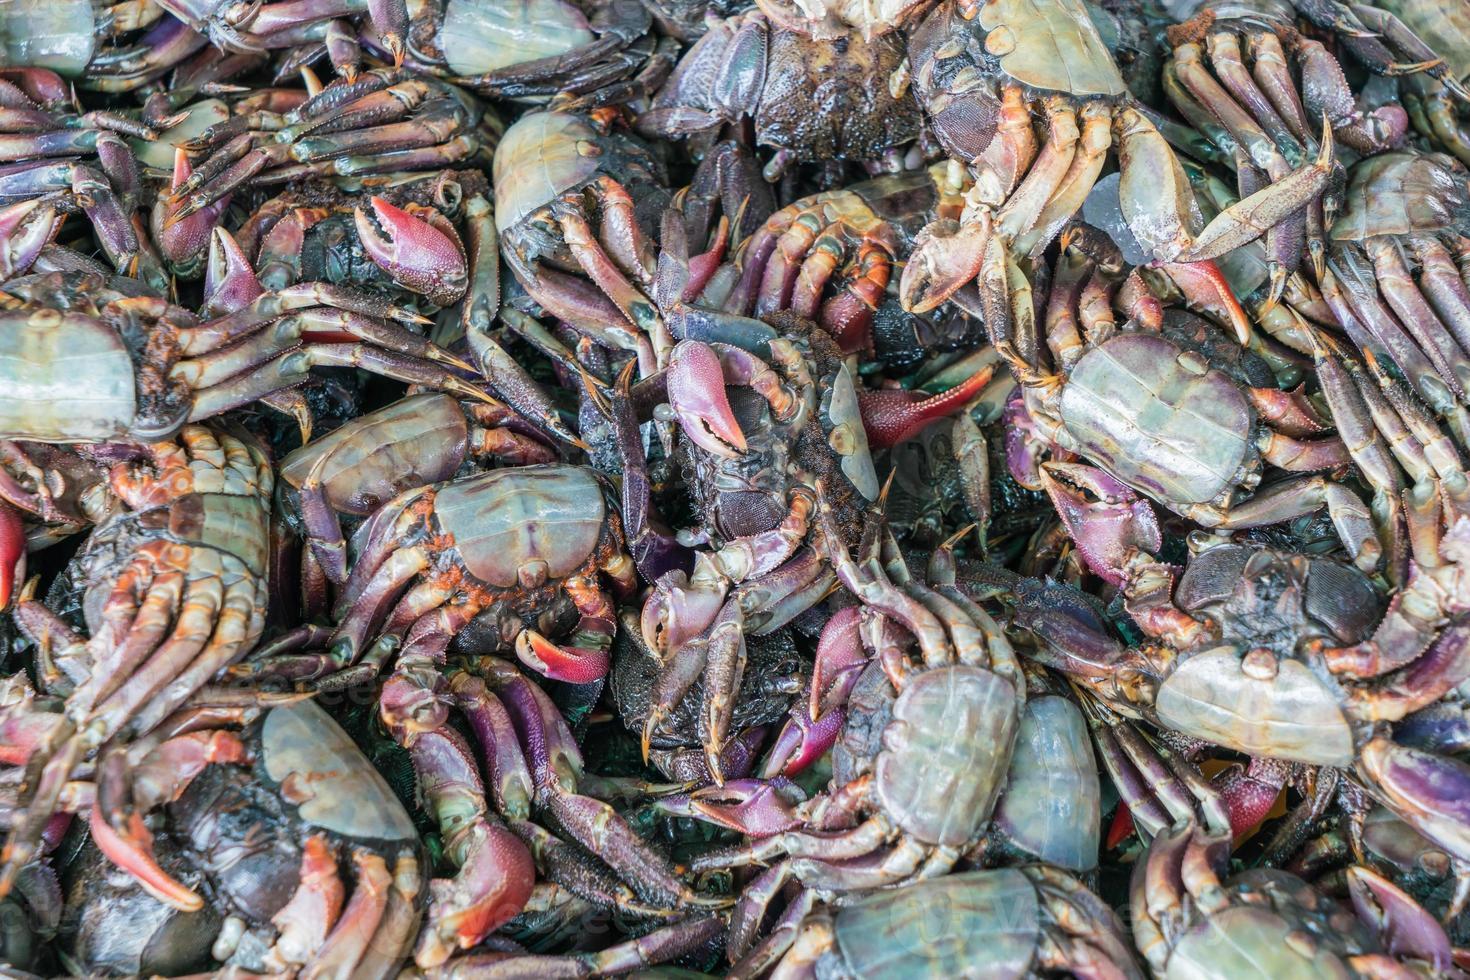 Fresh black crab at the market photo